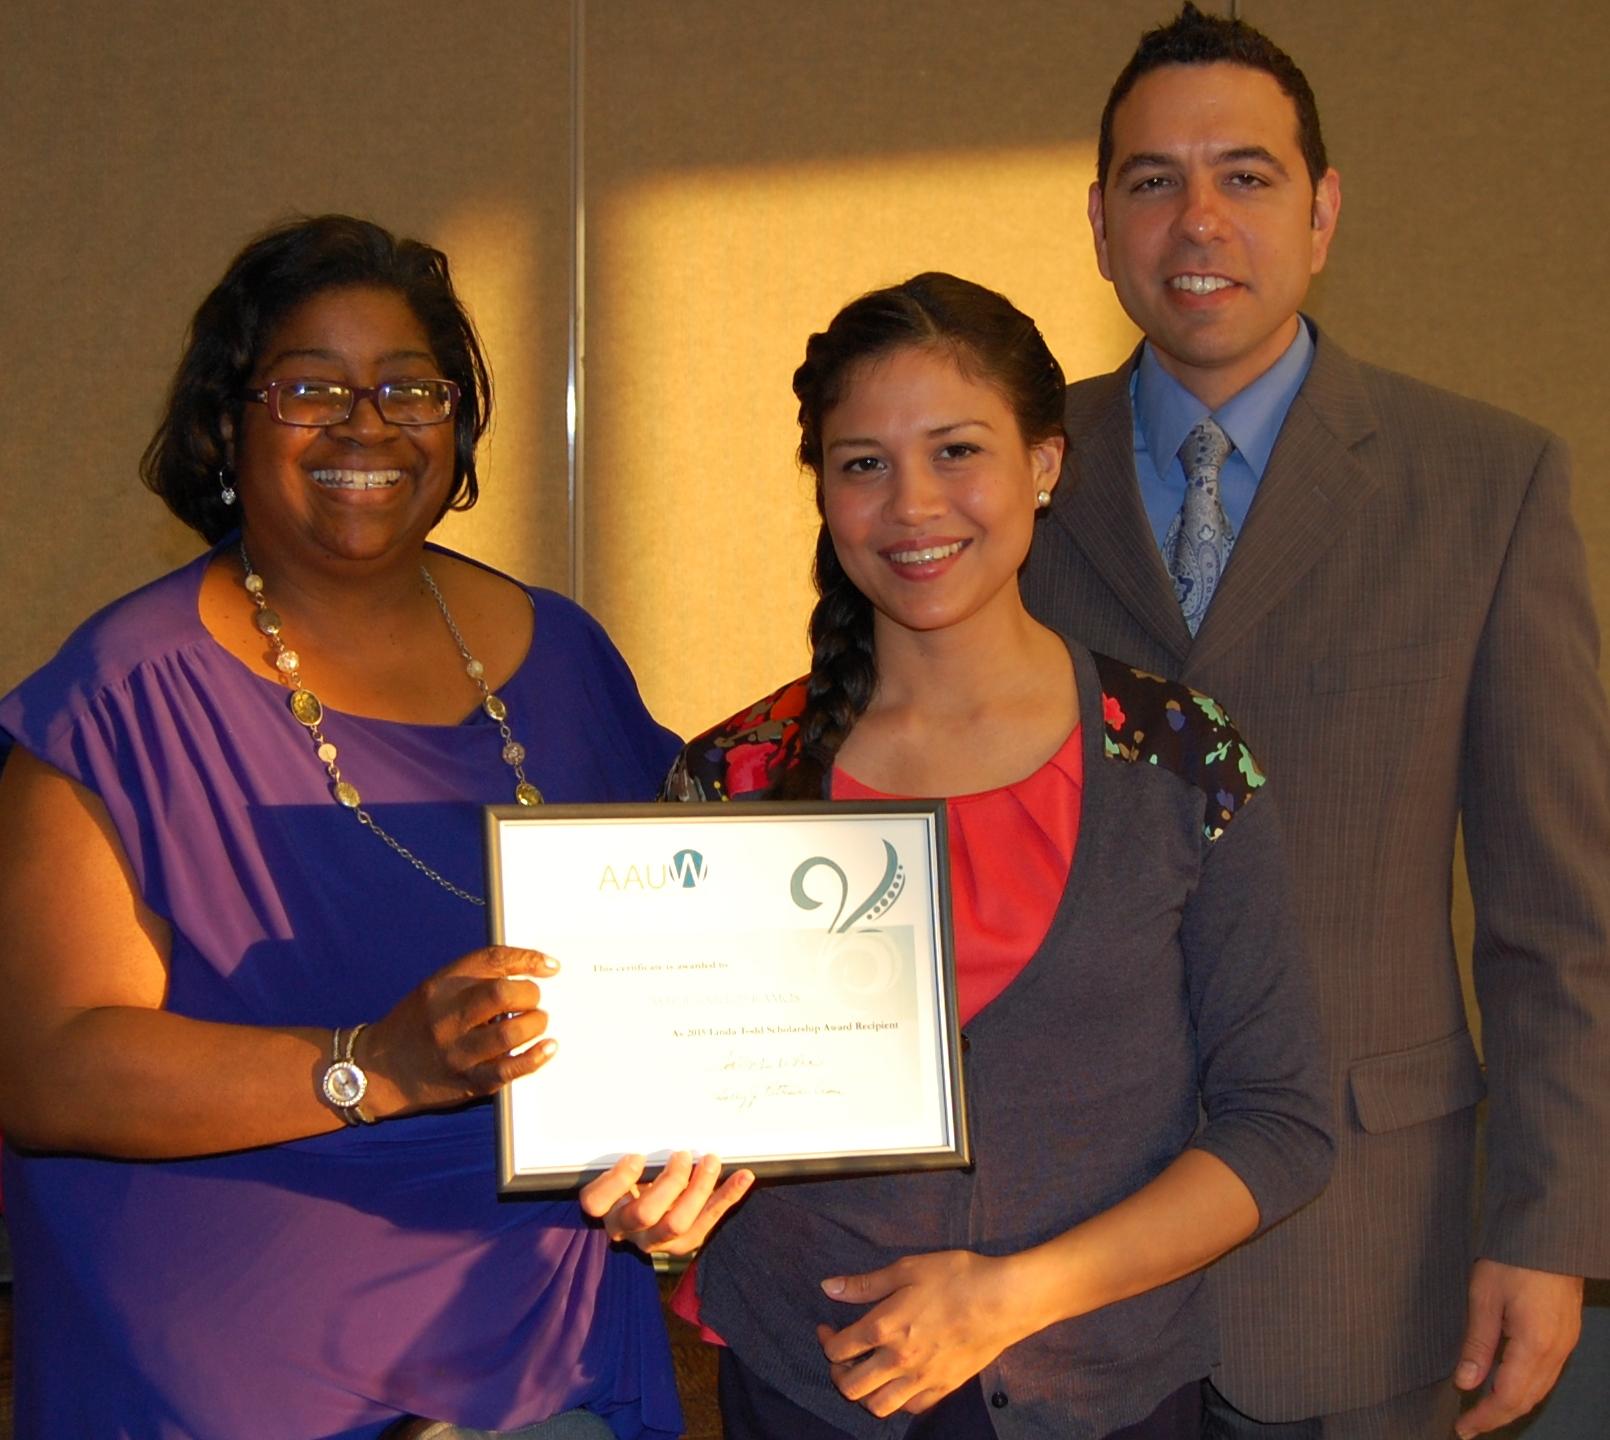 Scholarship recipient Maria Ramos and her husband.